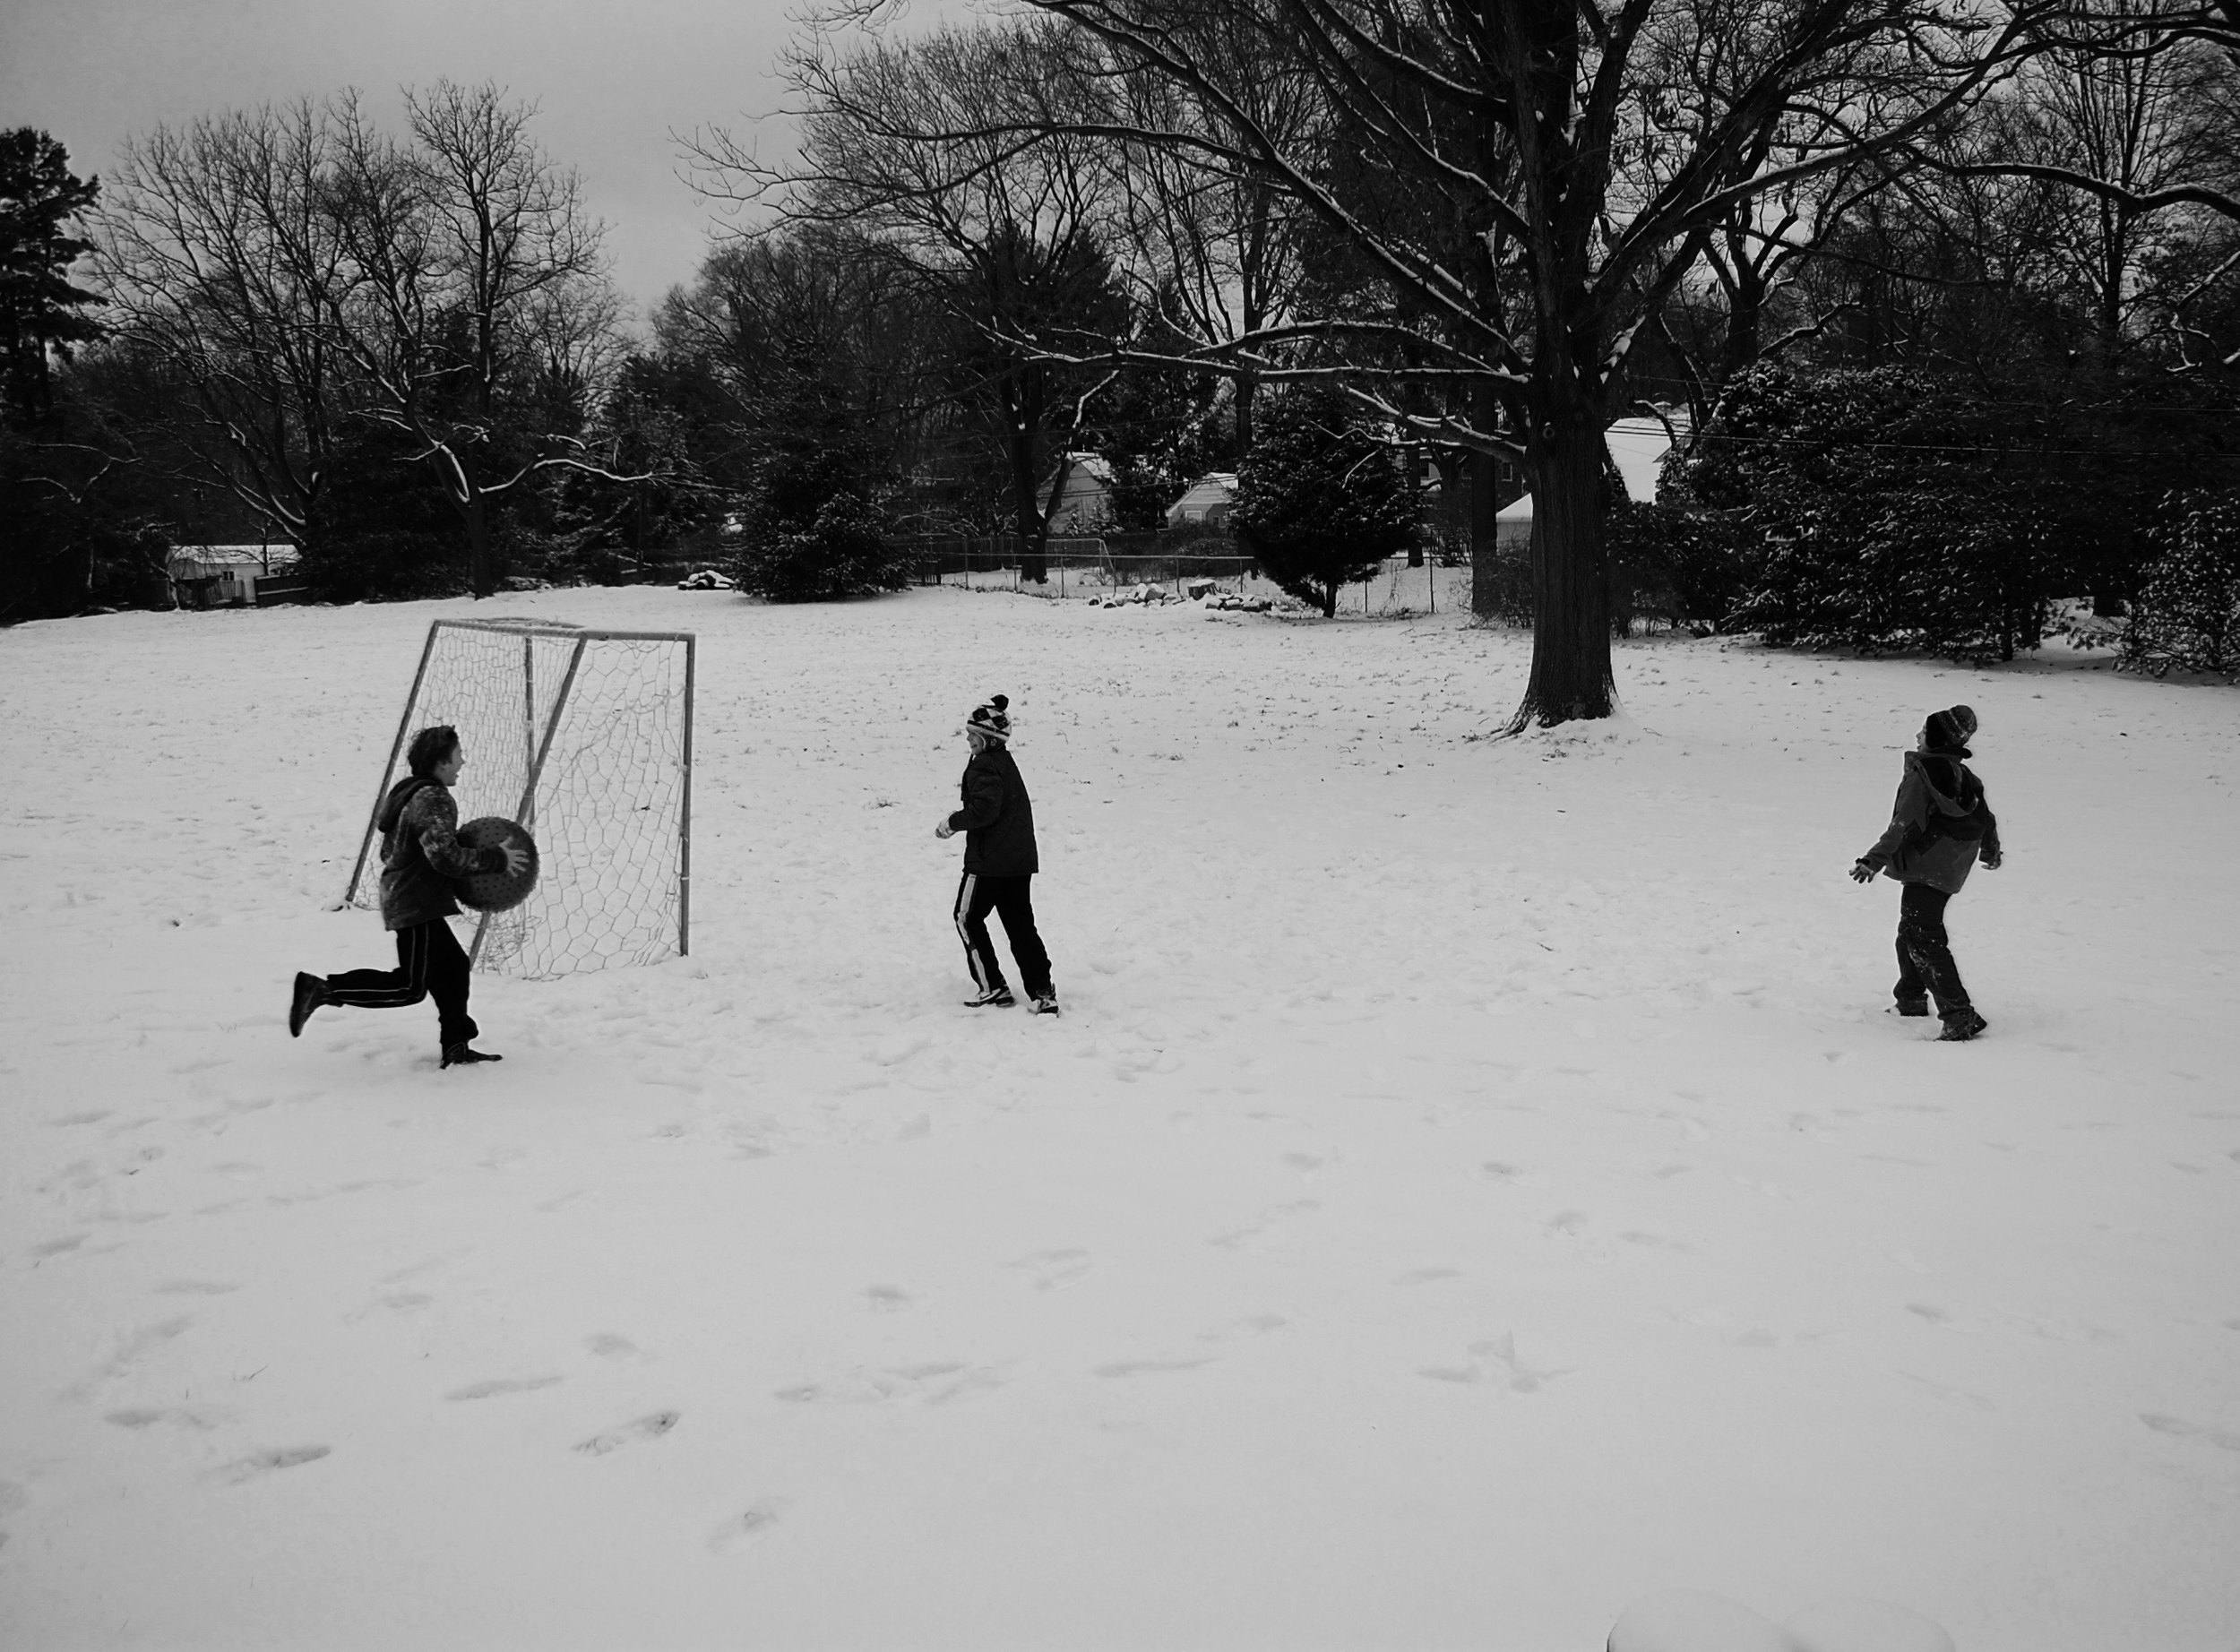 Winter #4